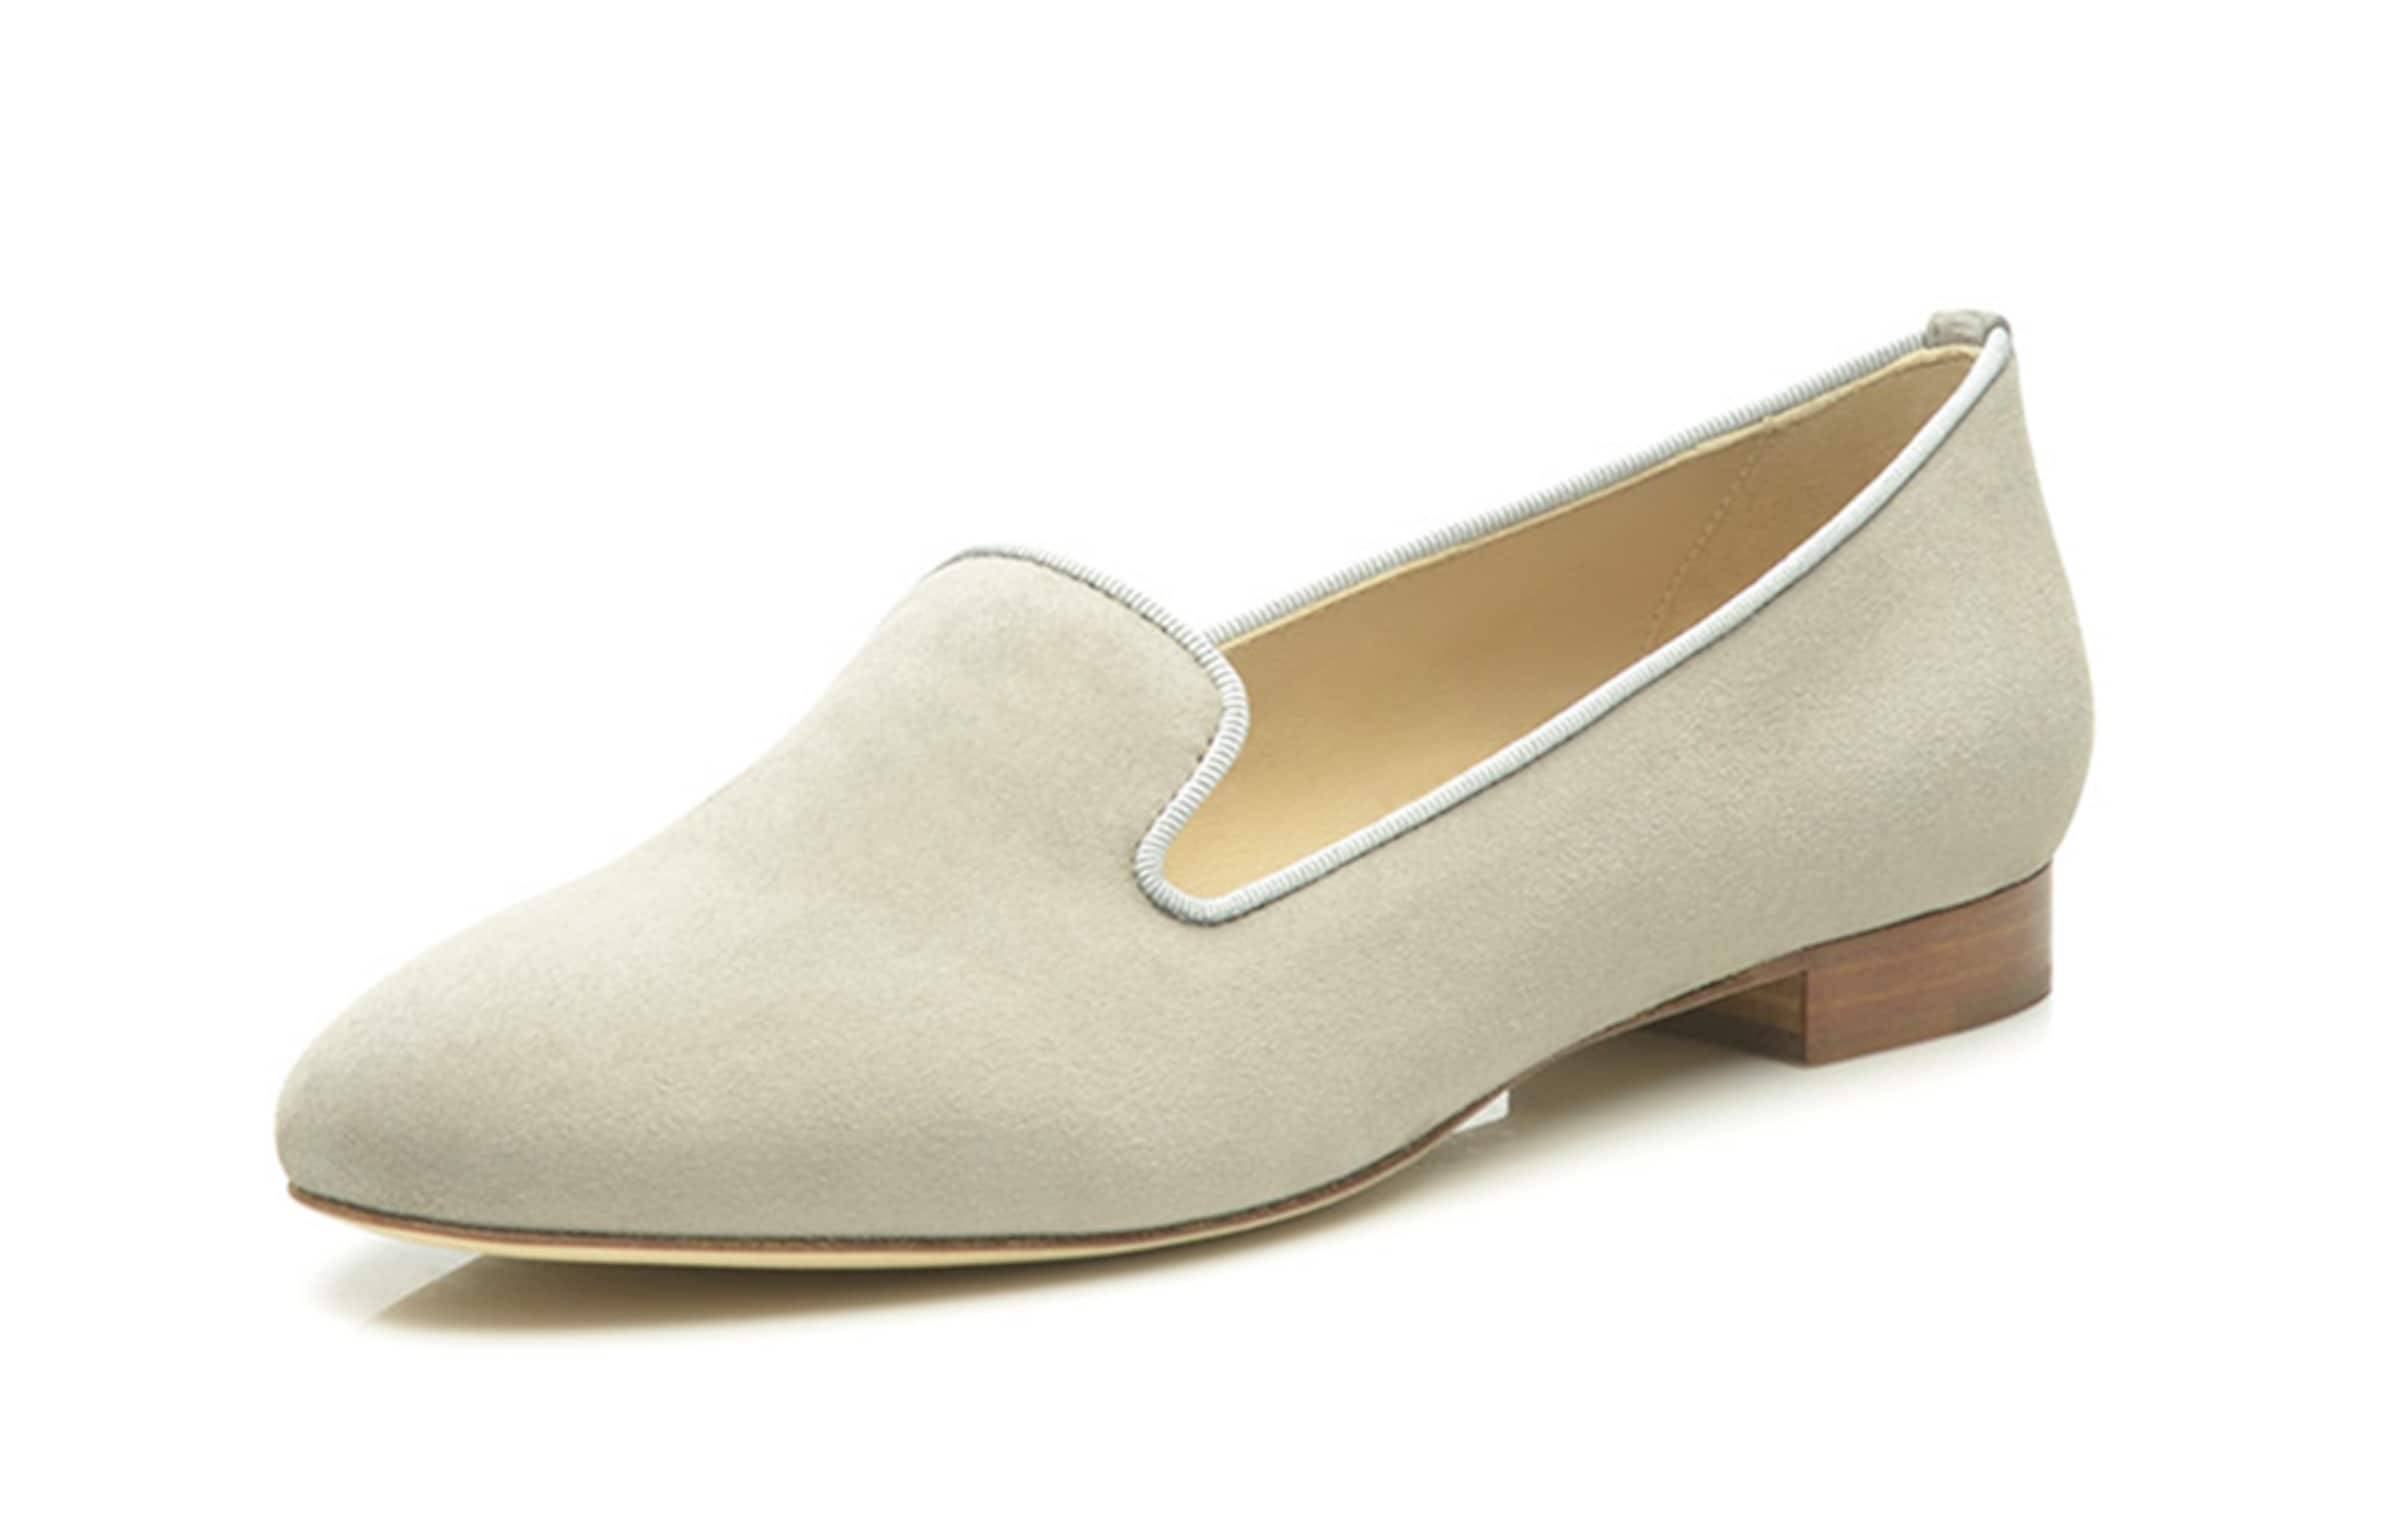 SHOEPASSION Loafer  No. 23 WL